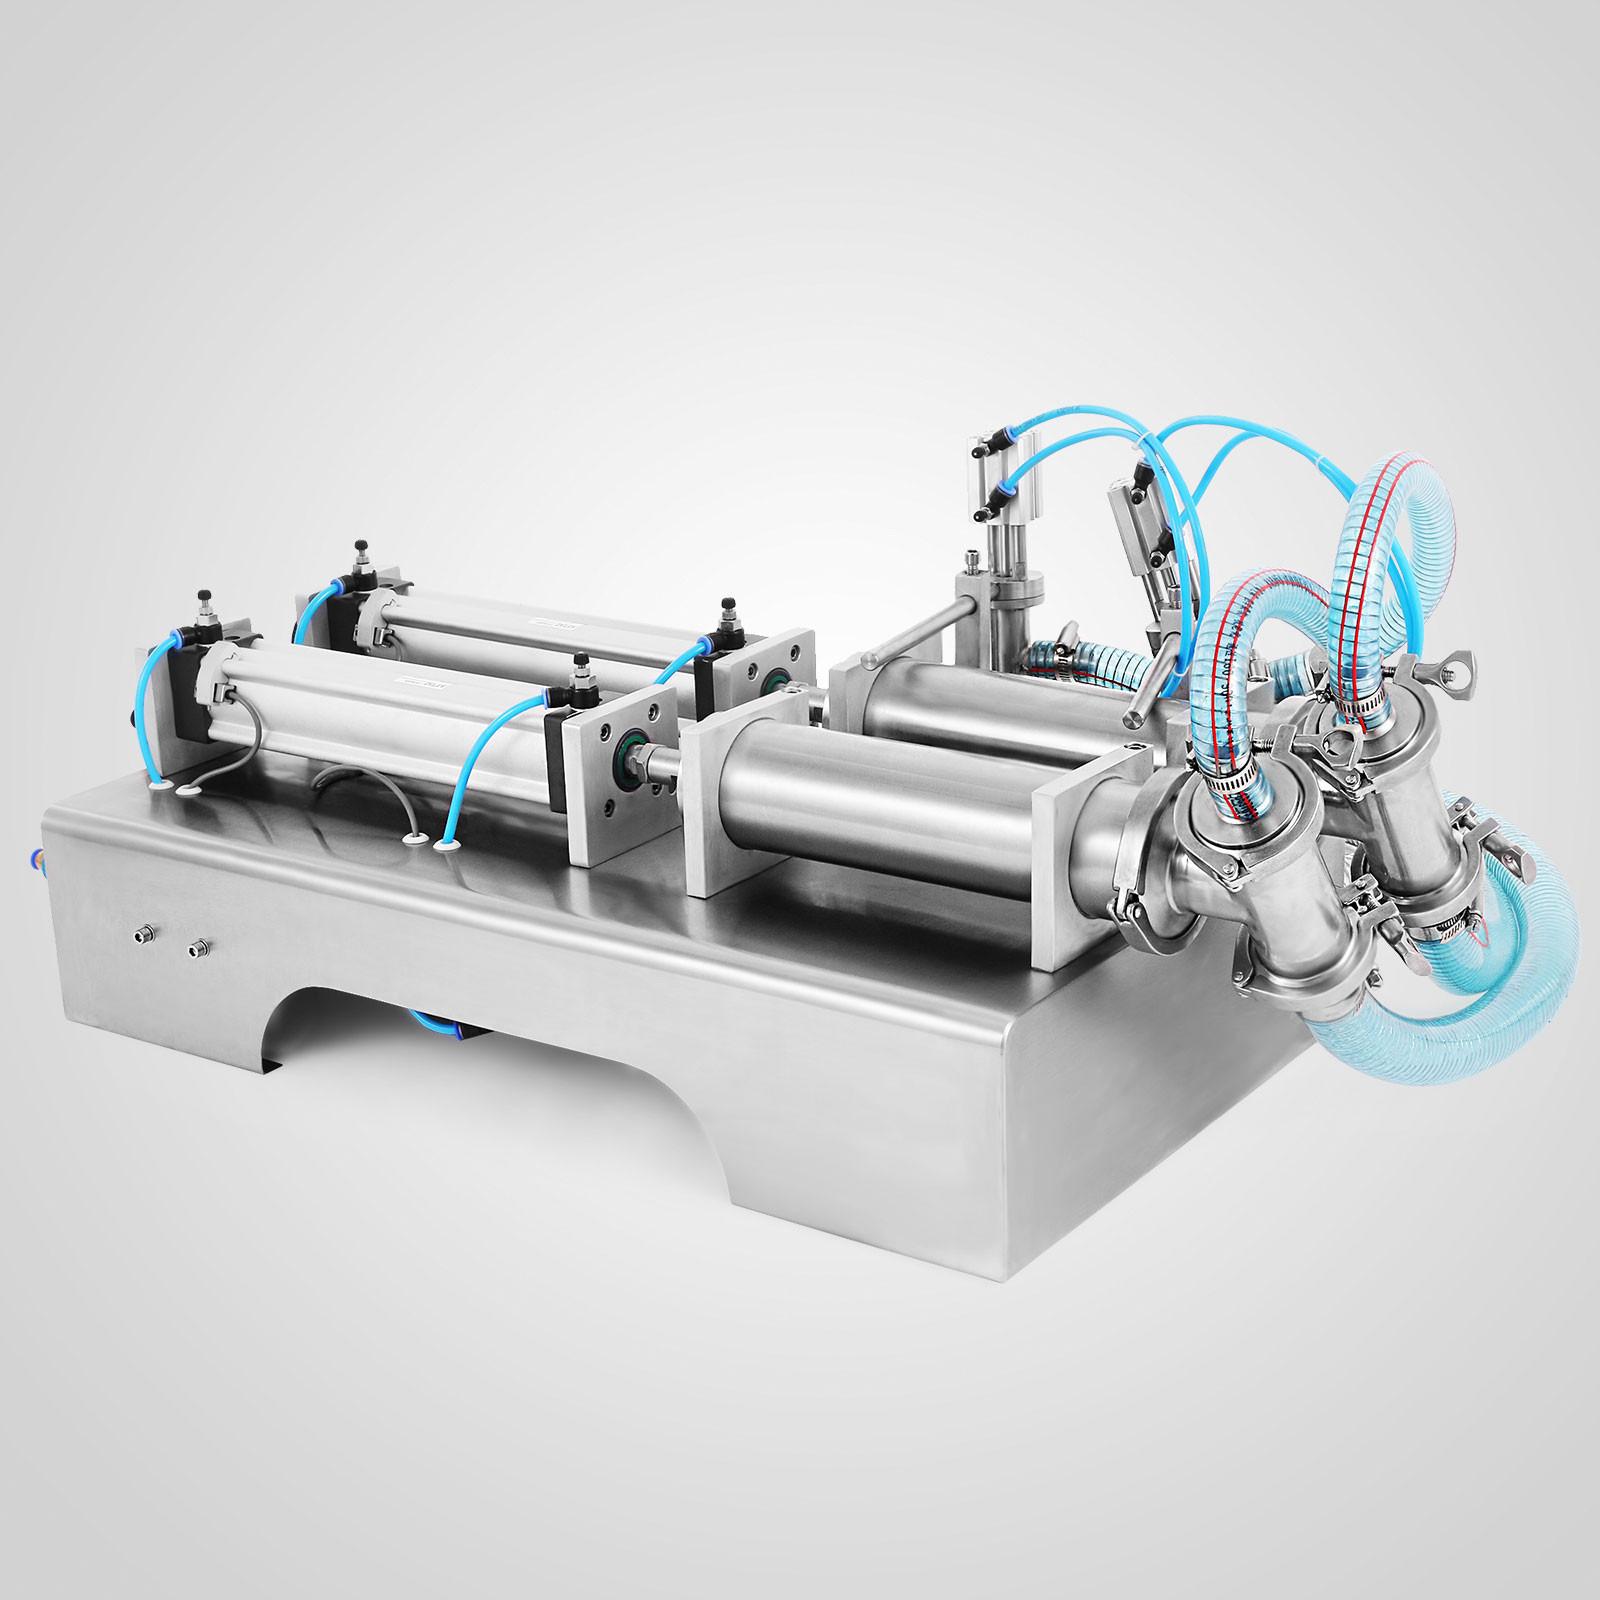 Liquid-Filling-Machine-Filler-Remplissage-2-3500ML-50-500ML-INDUSTRY-SUPPLY miniature 80